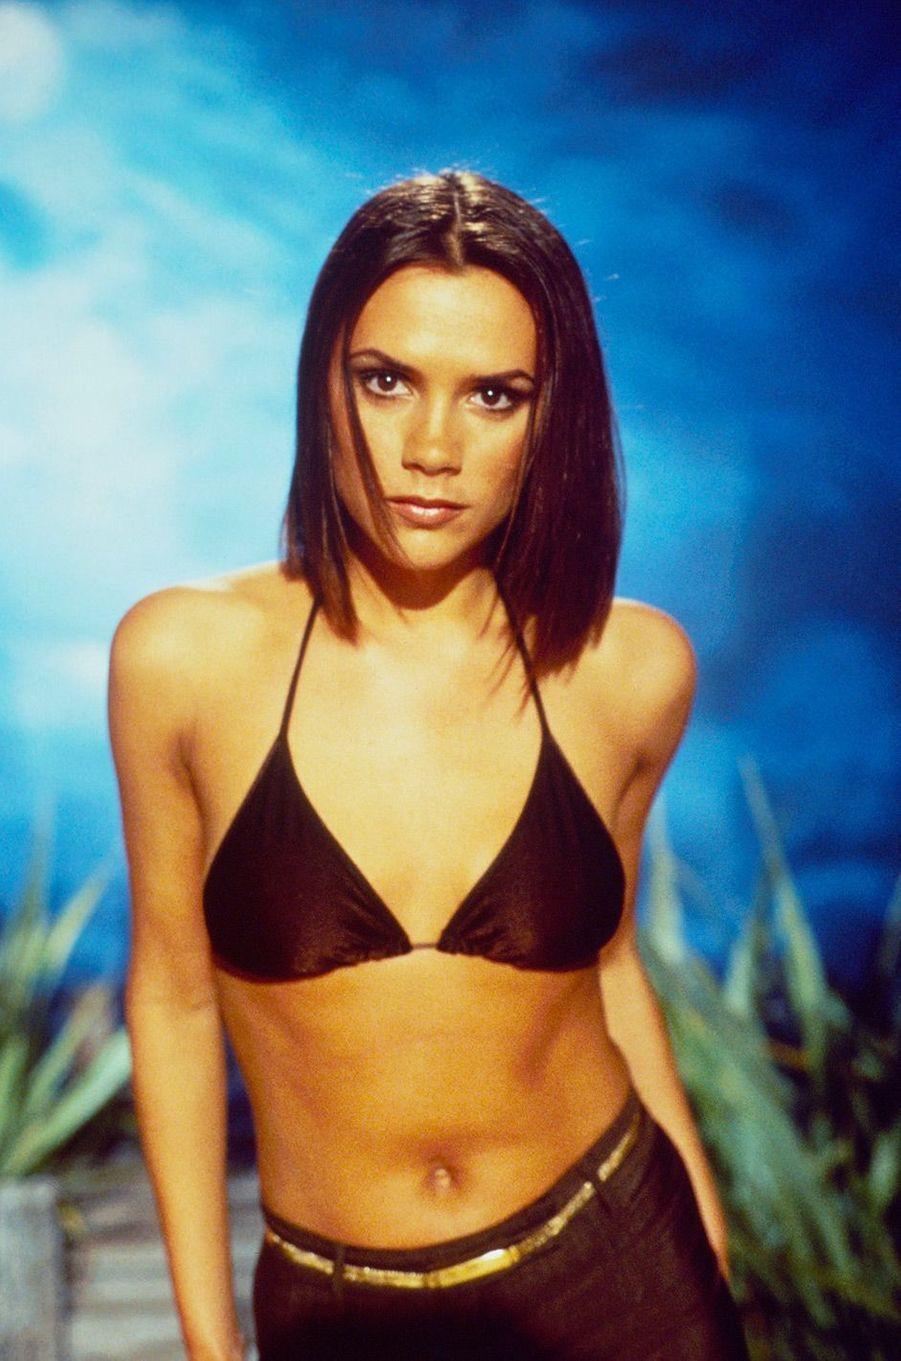 Victoria Beckham en 1997